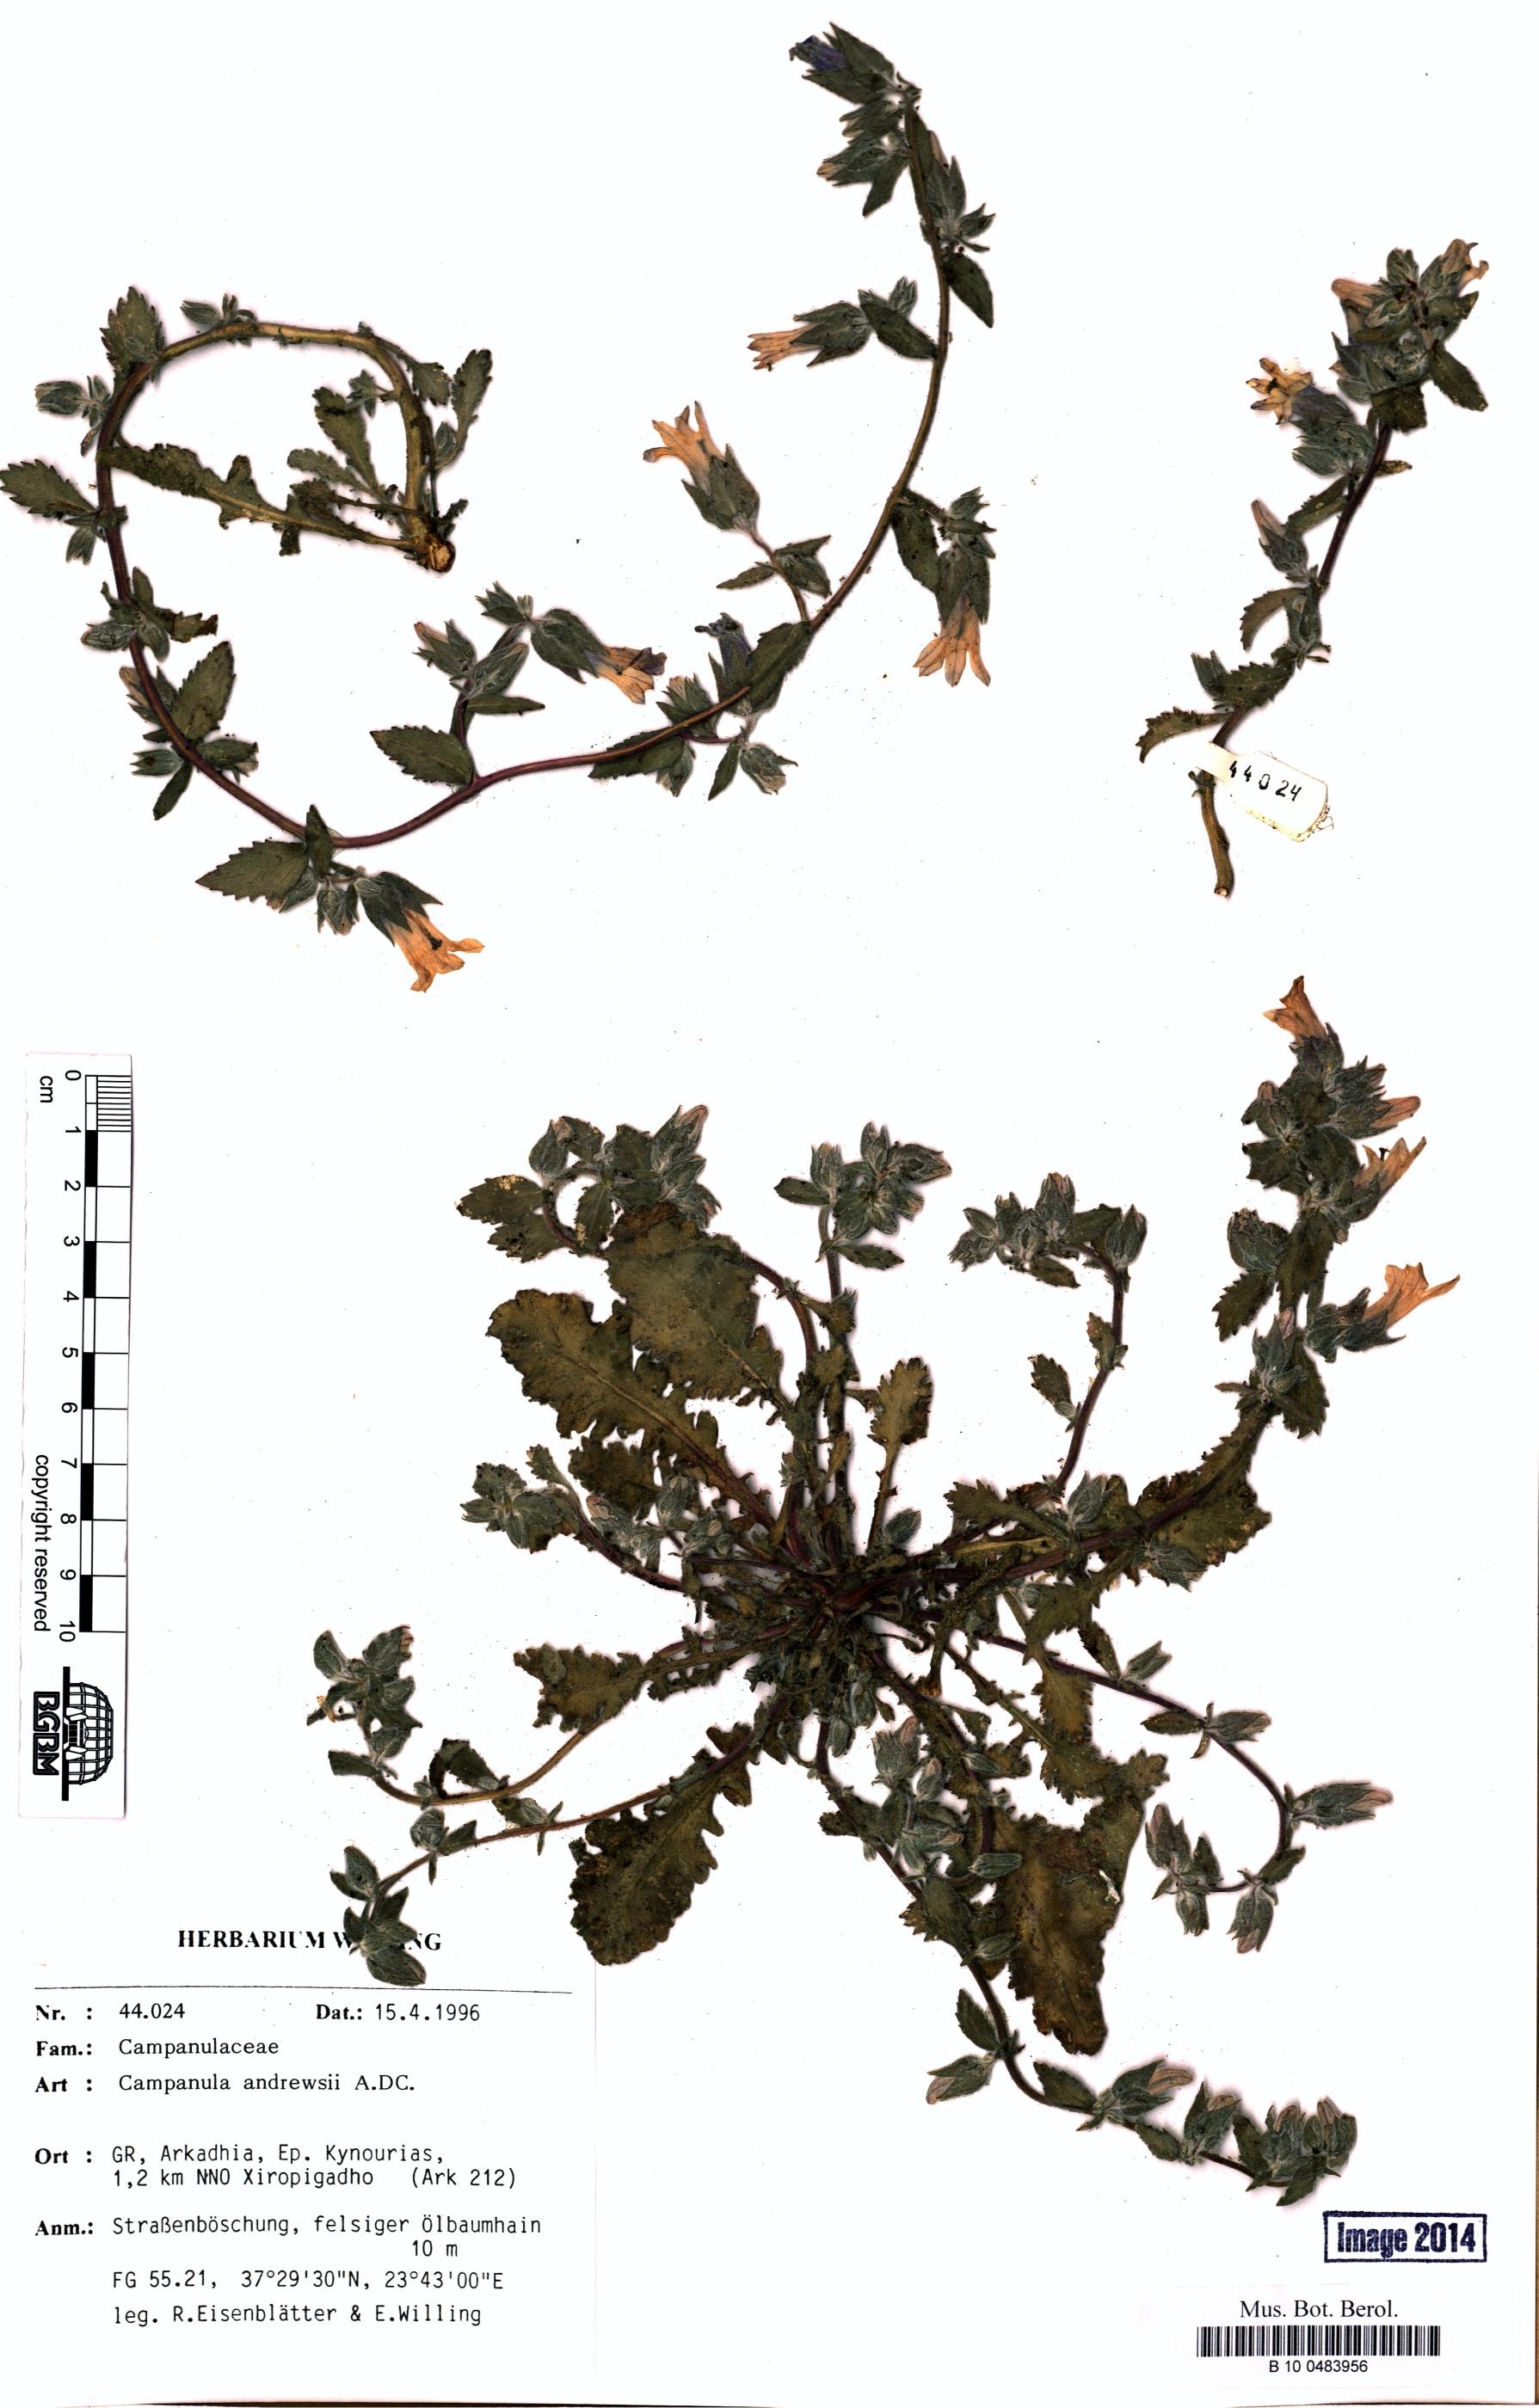 http://ww2.bgbm.org/herbarium/images/B/10/04/83/95/B_10_0483956.jpg